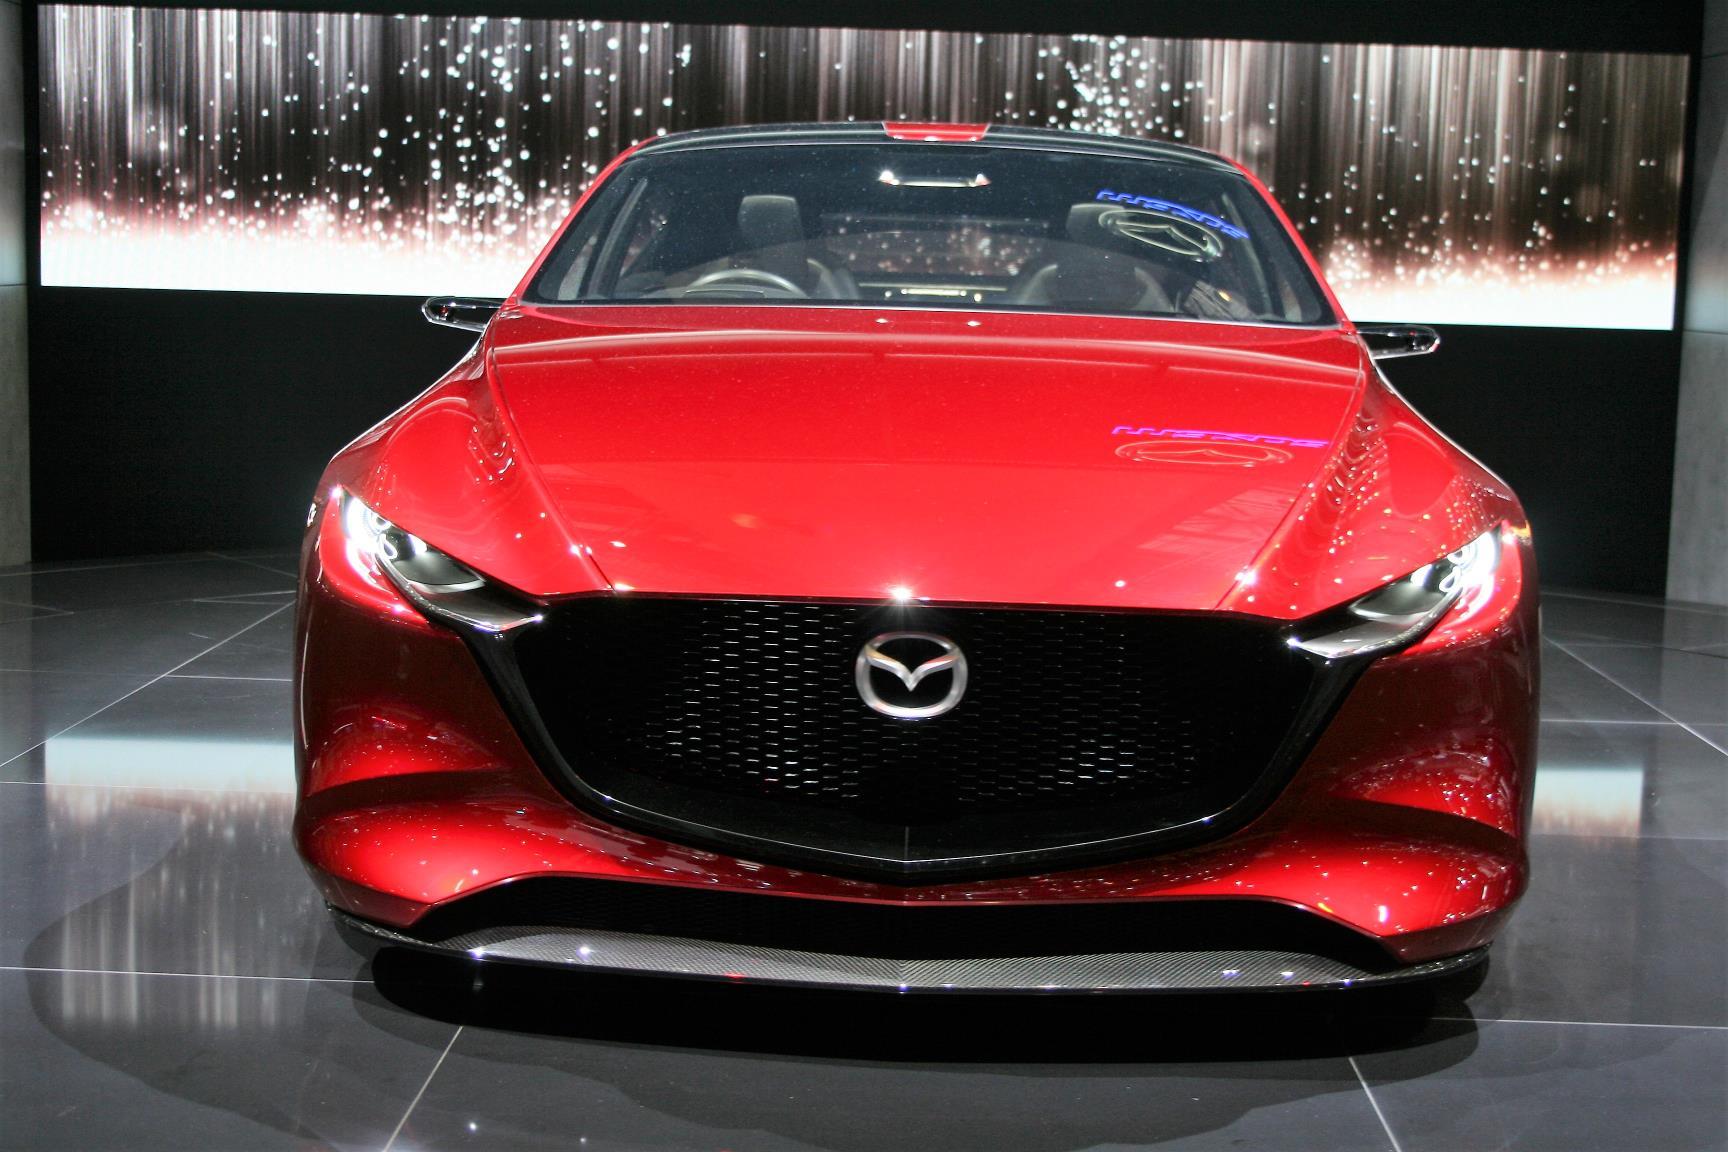 Geneva Motor Show 2018 Mega Gallery Part 1 (126)